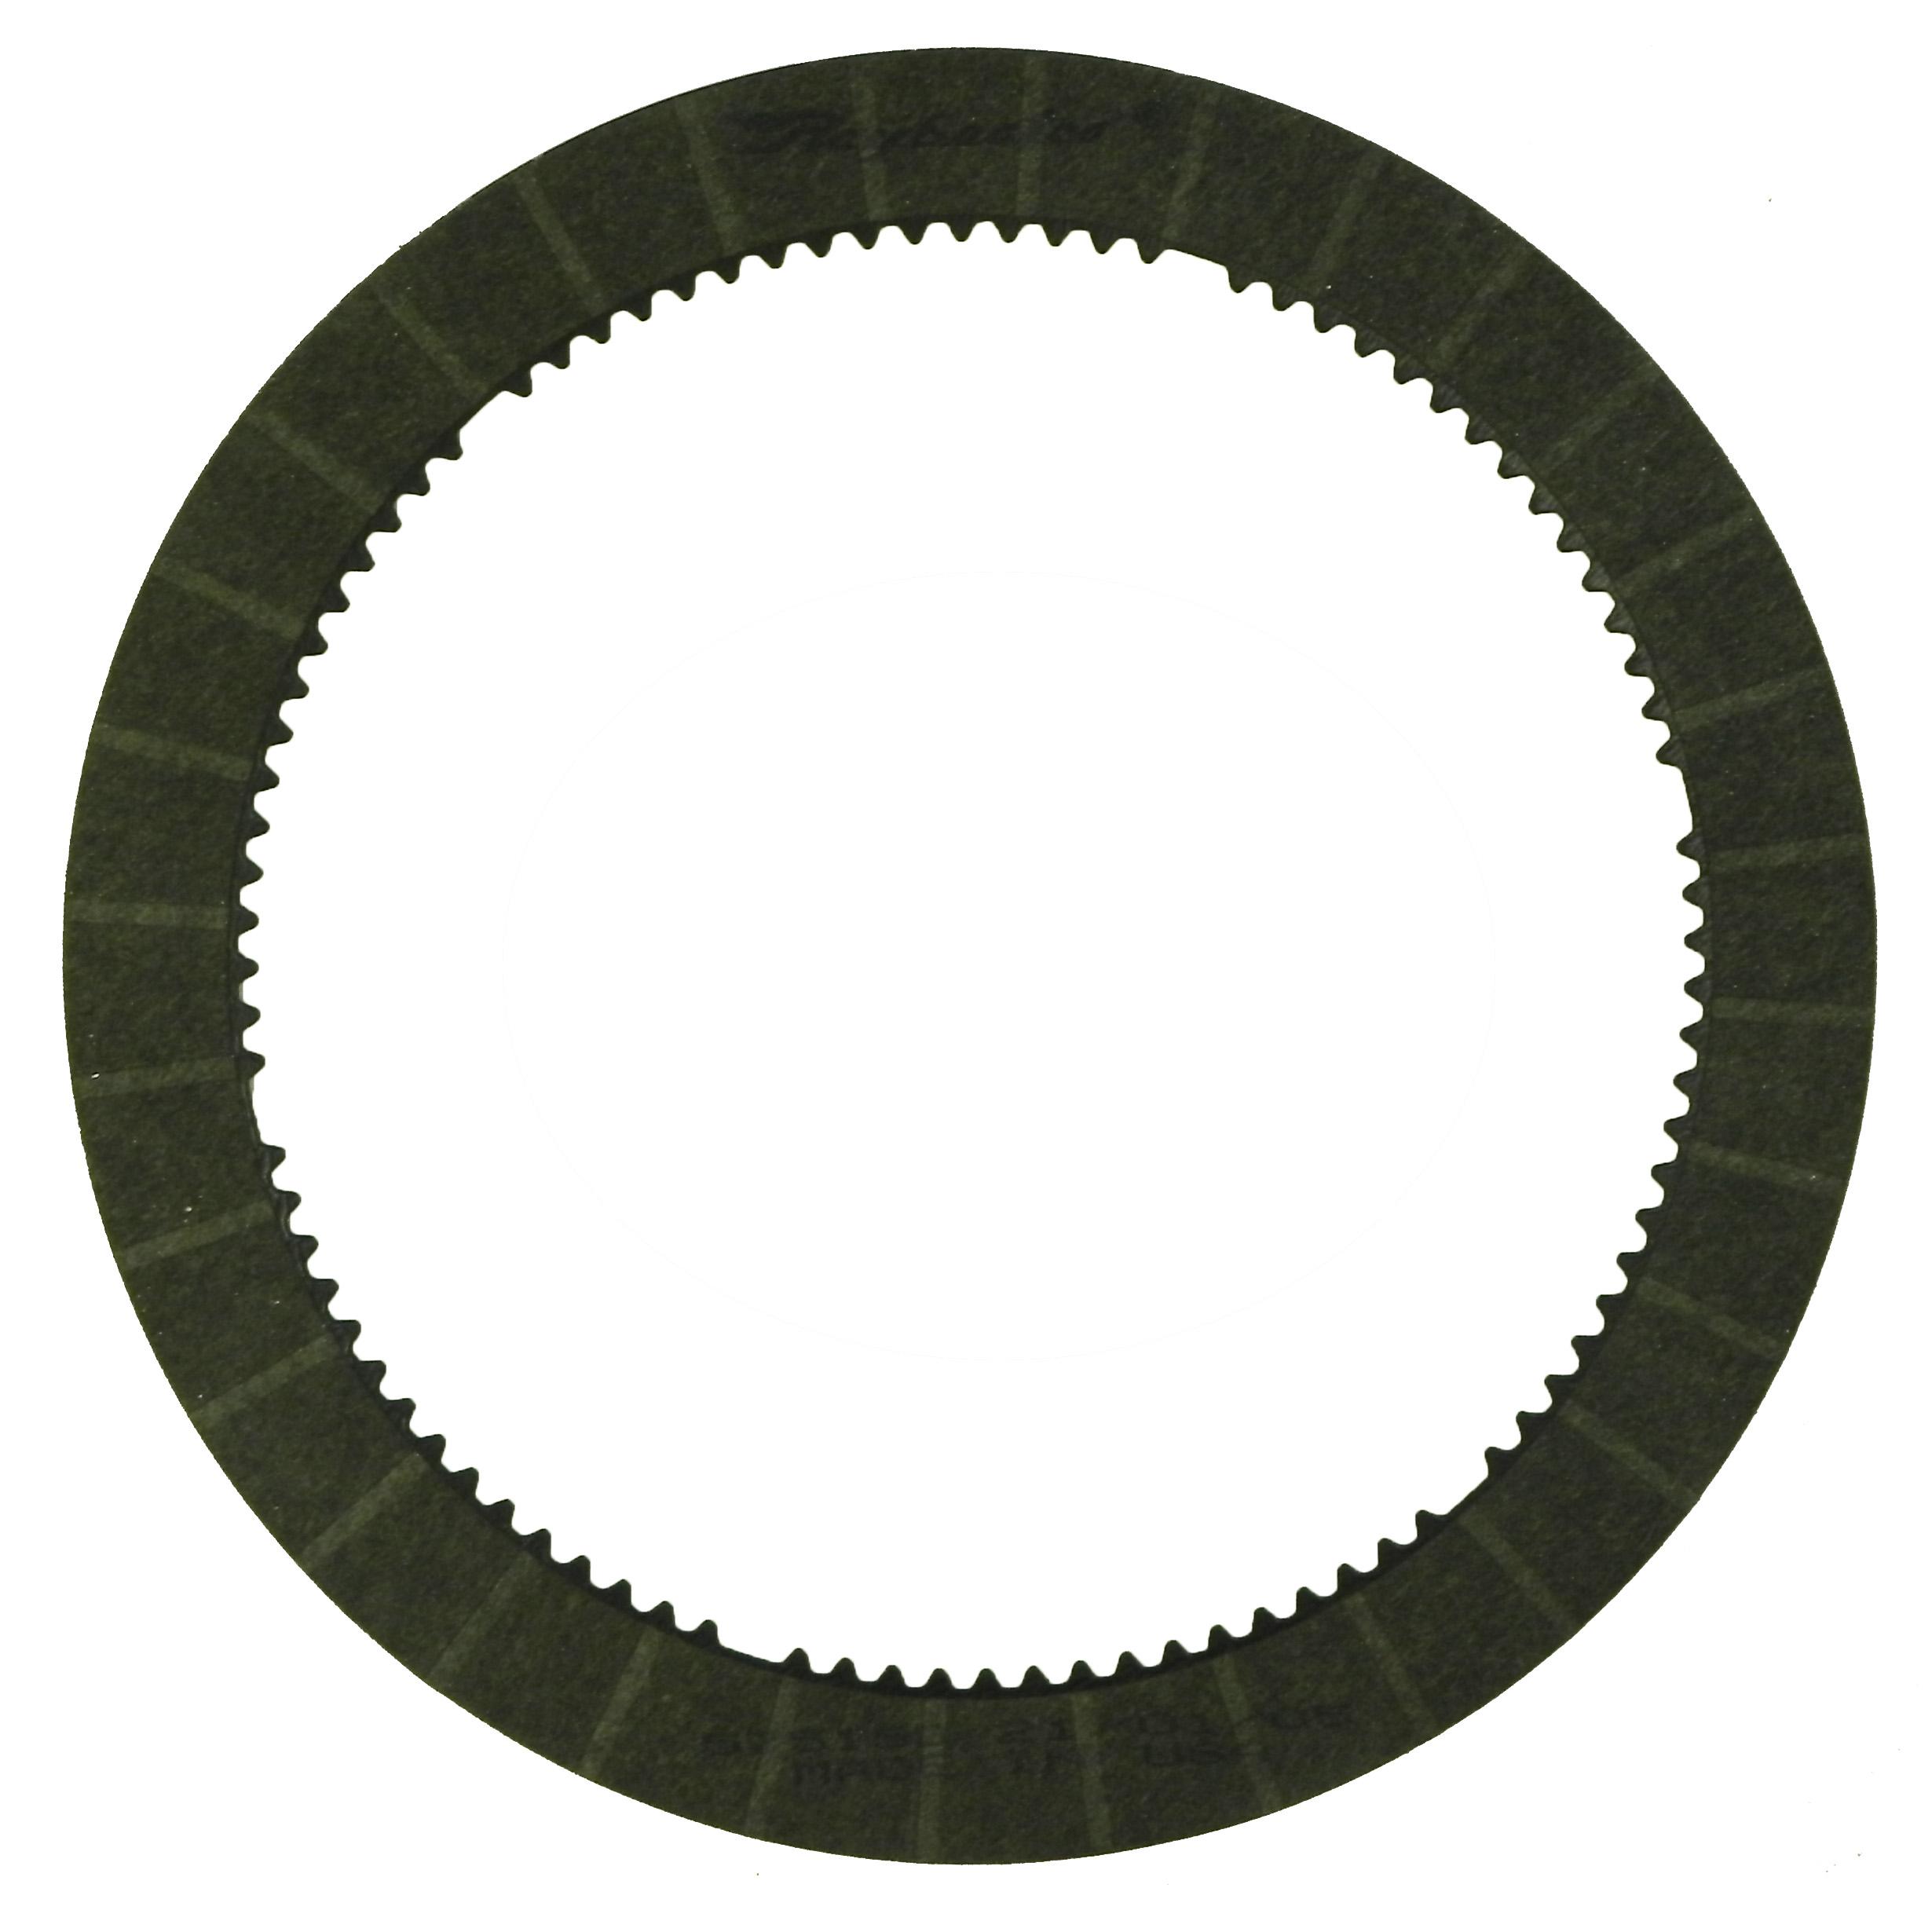 5R110W TorqShift High Energy Friction Clutch Plate